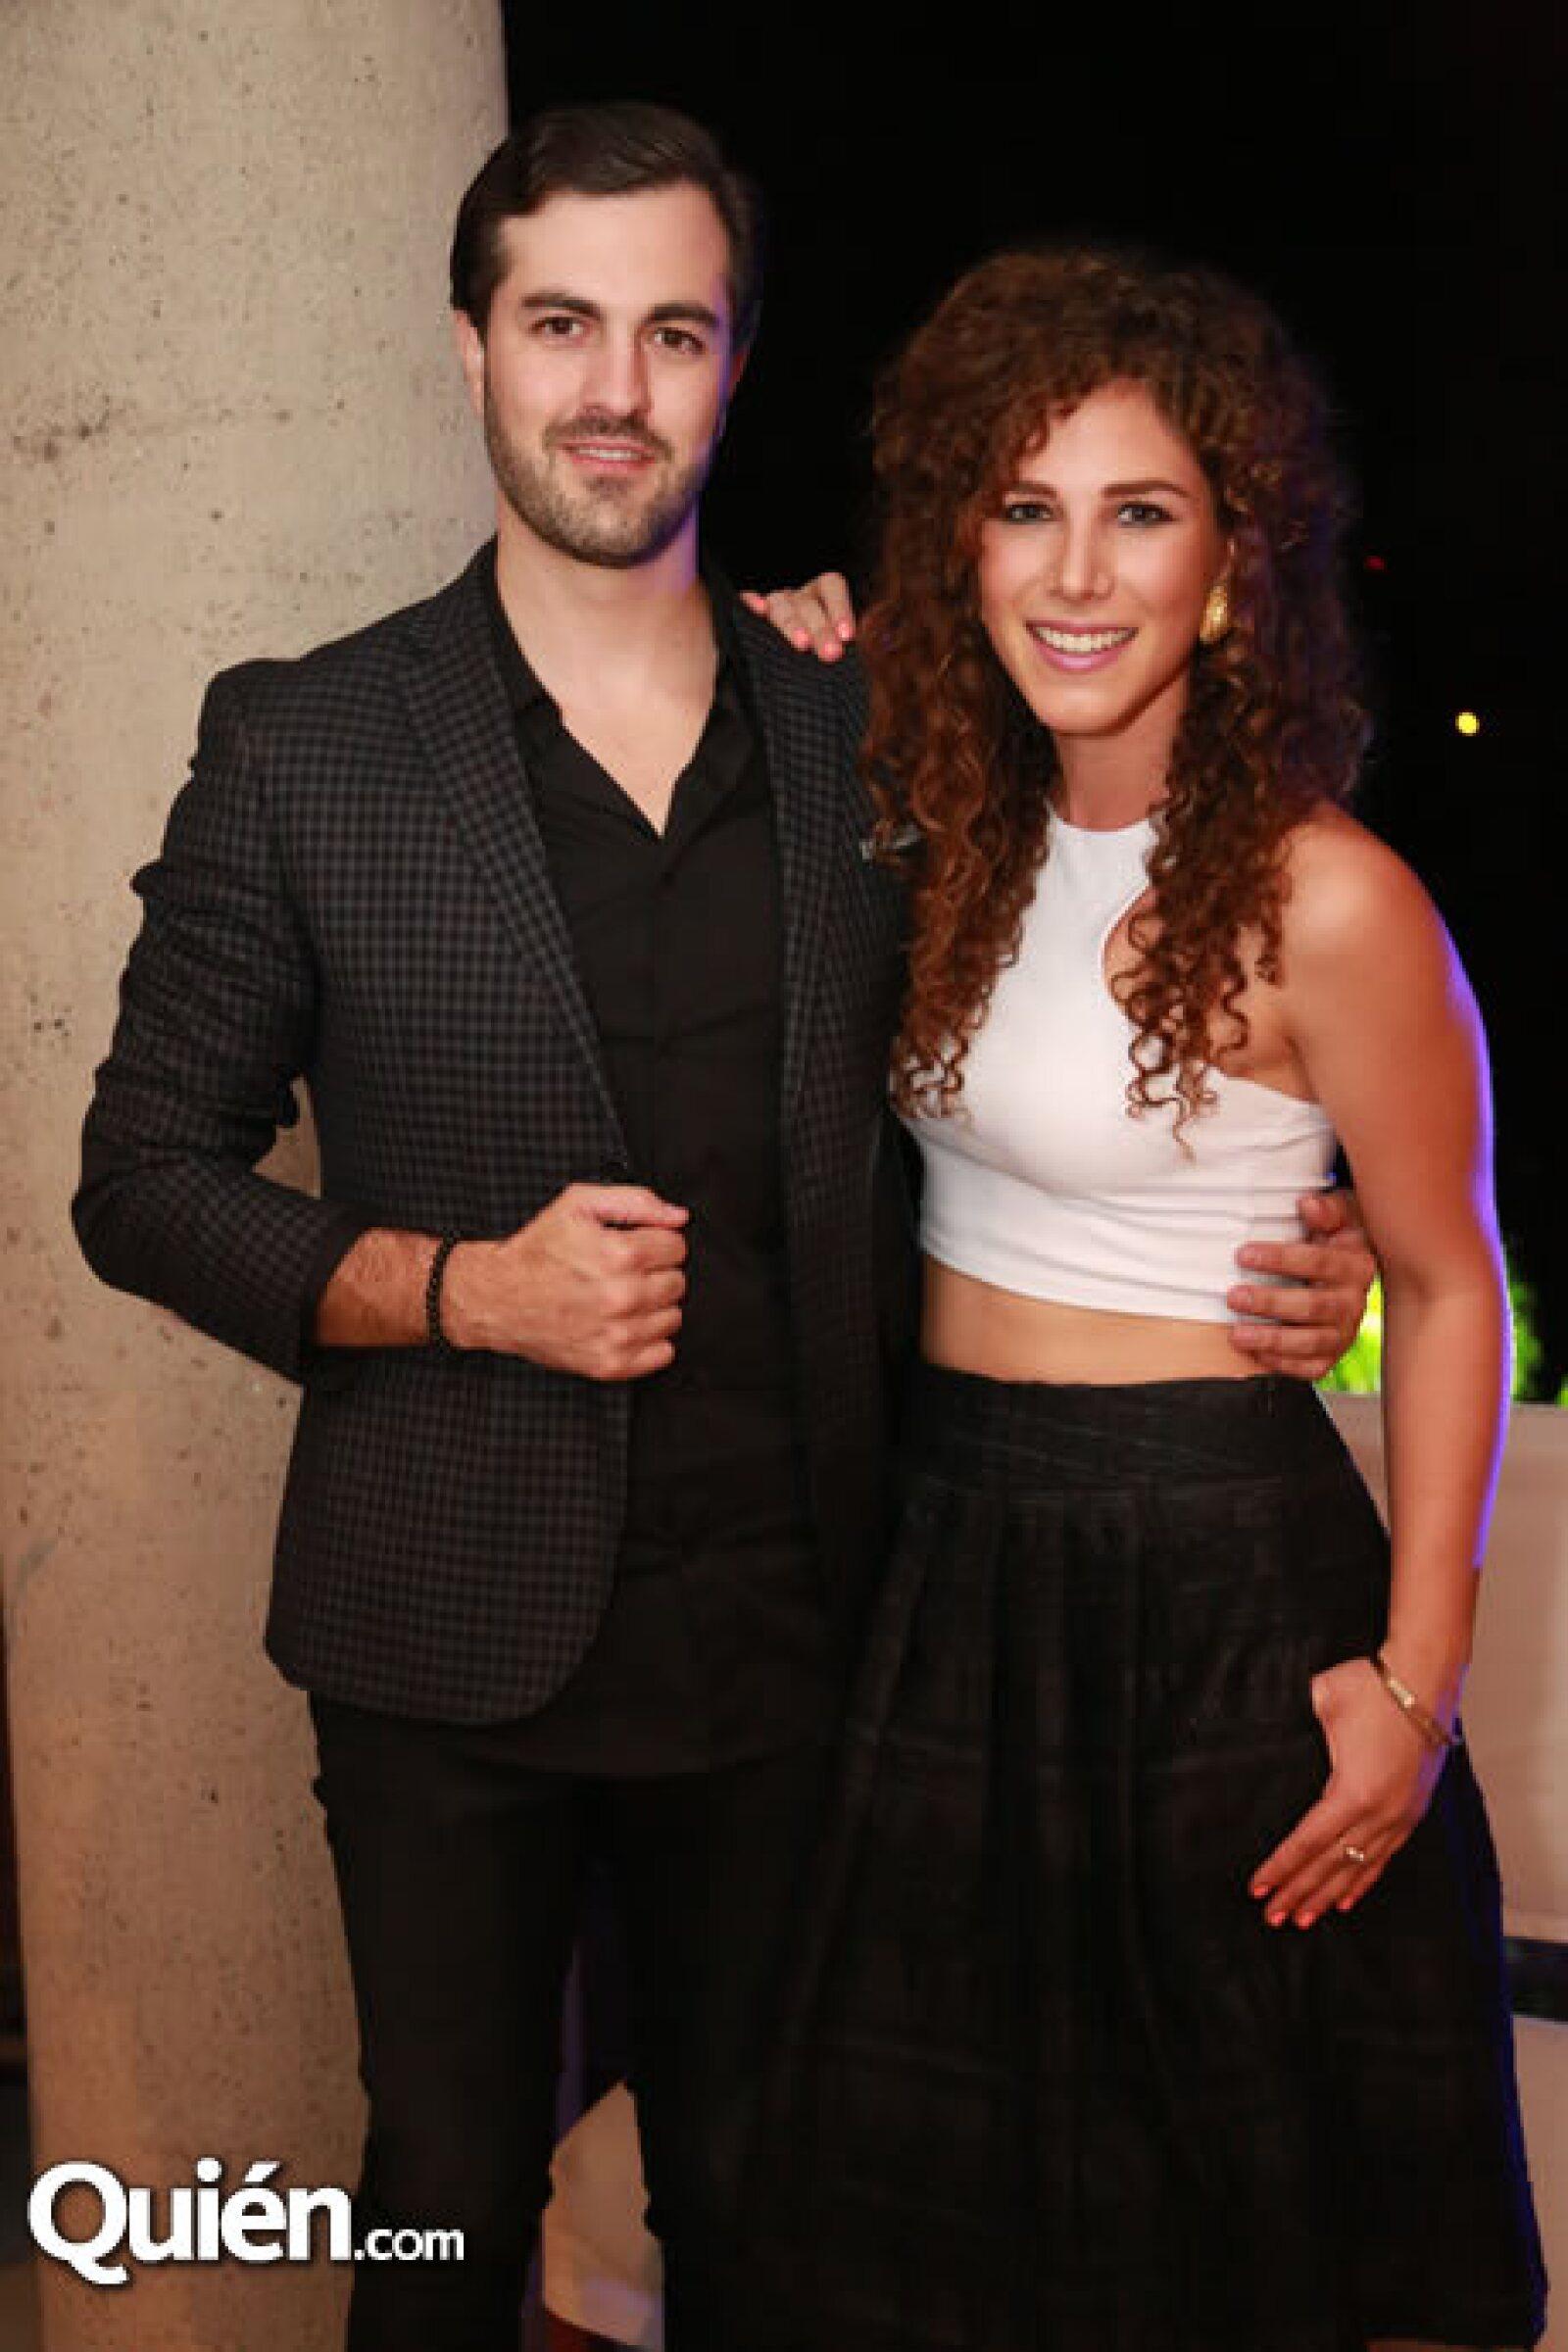 Humberto González y Chantal Chalita